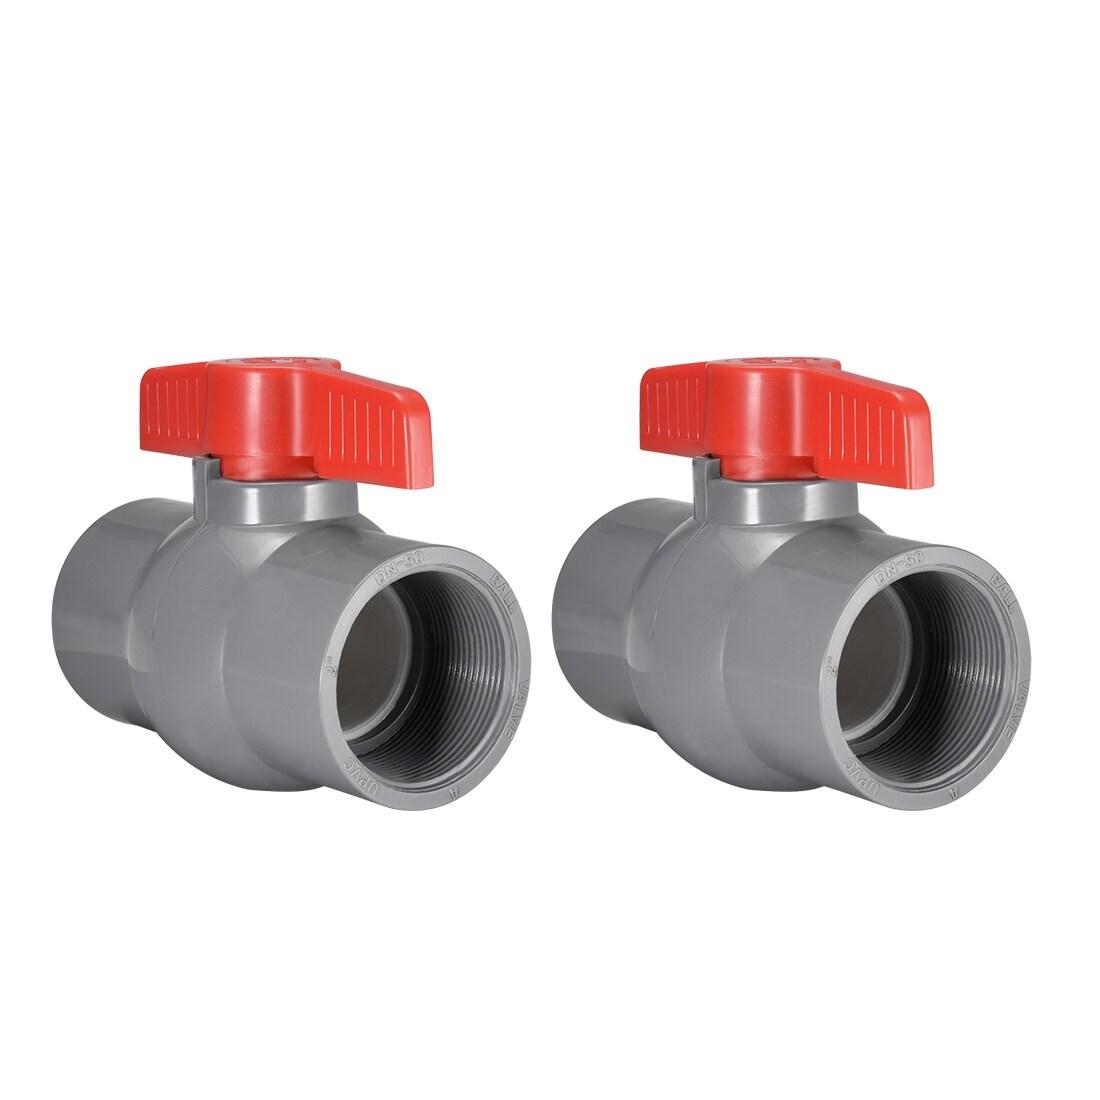 PVC Ball Valve Supply Pipe Knob Thread Ends 2 Inner Hole Diameter Red Gray 2Pcs